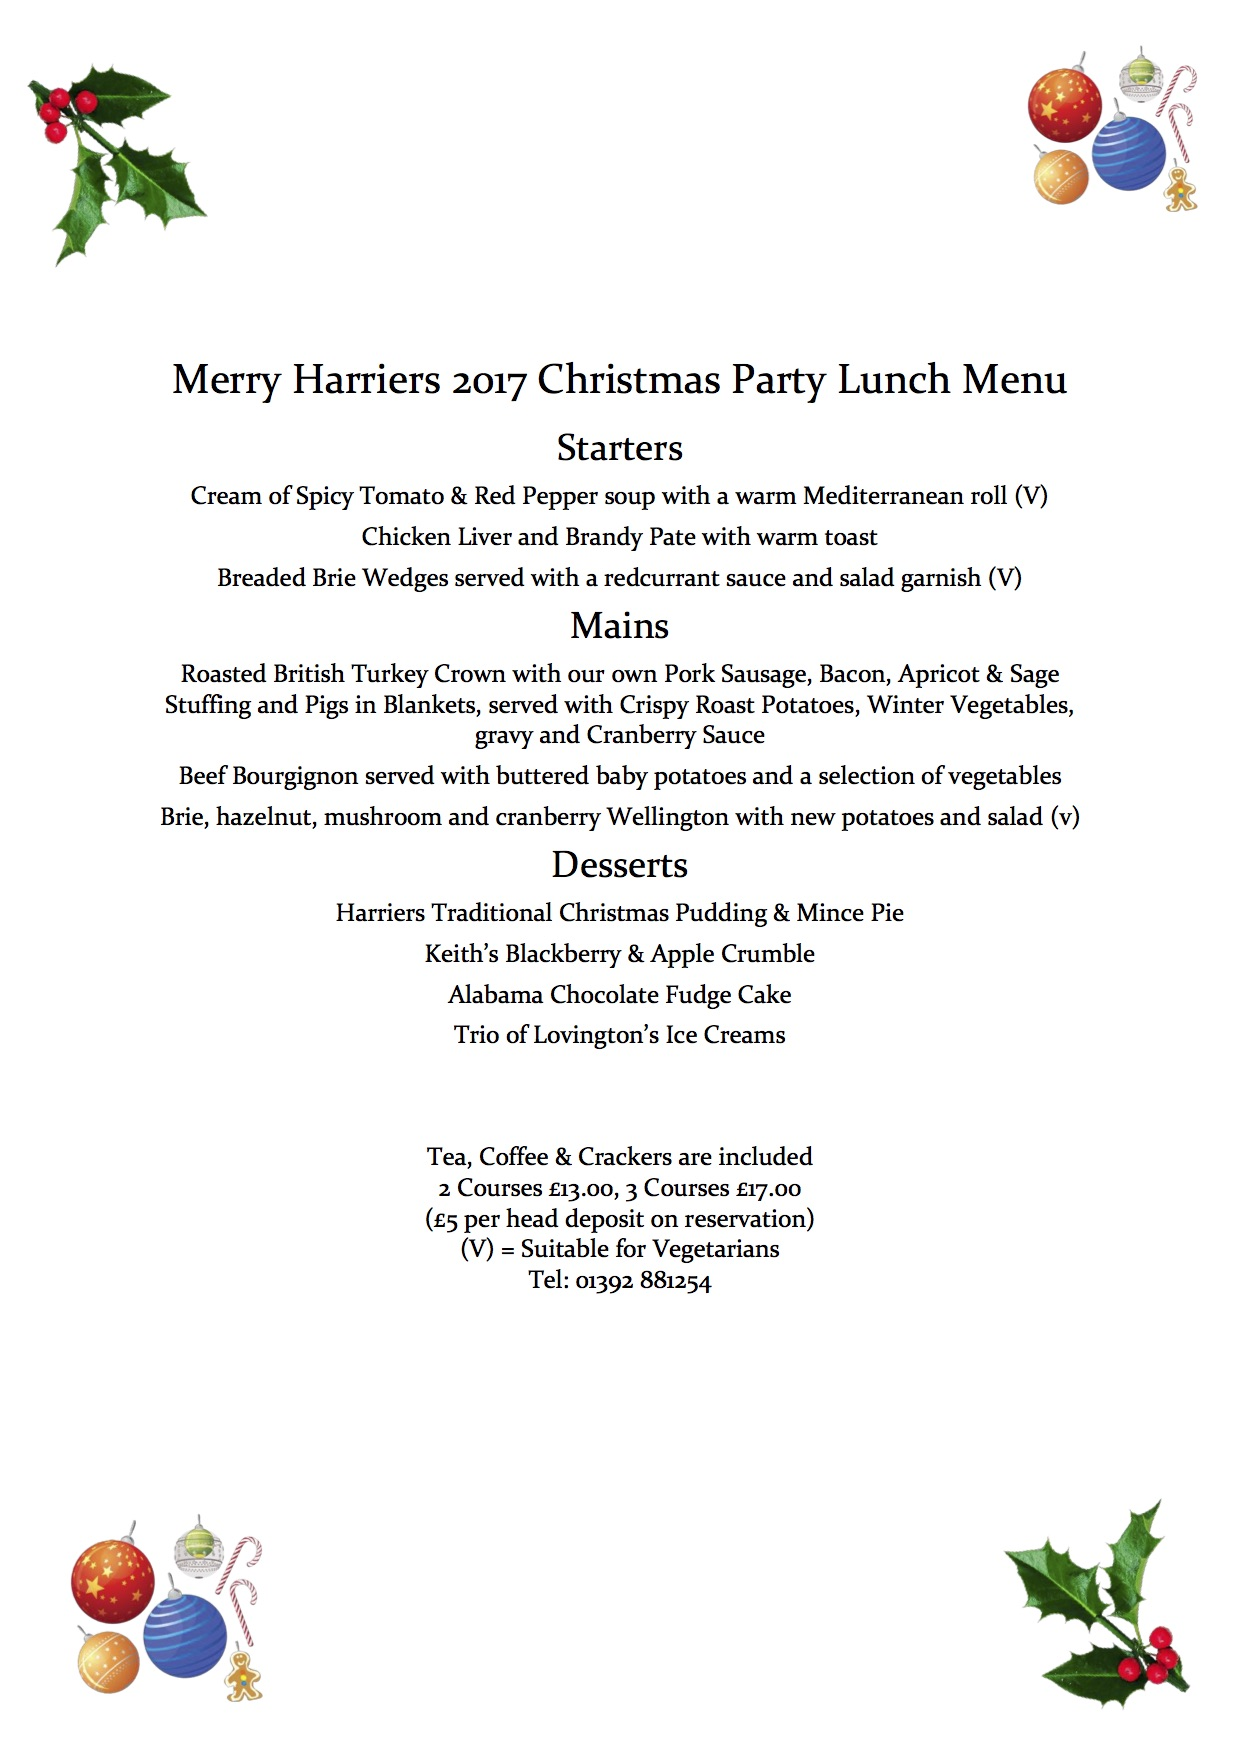 Christmas Party Lunch Menu 2017 PDF